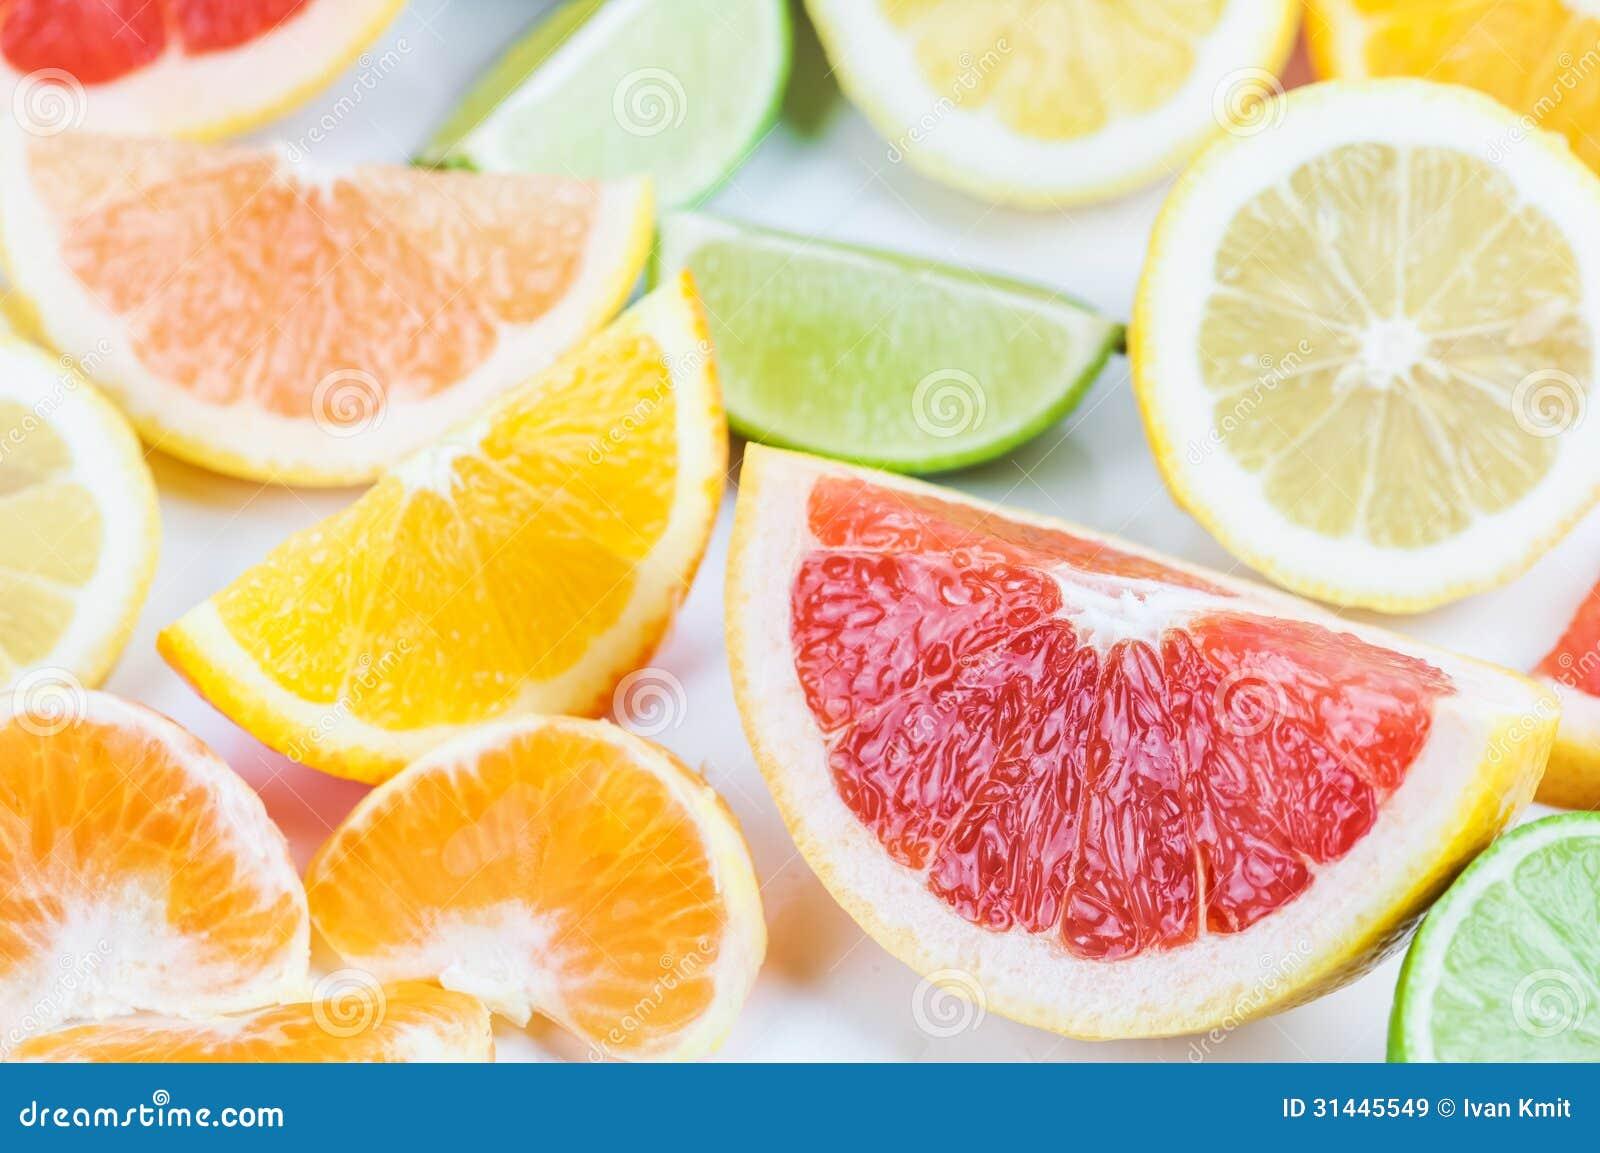 Grapefruit Royalty Free Stock Images - Image: 31445549